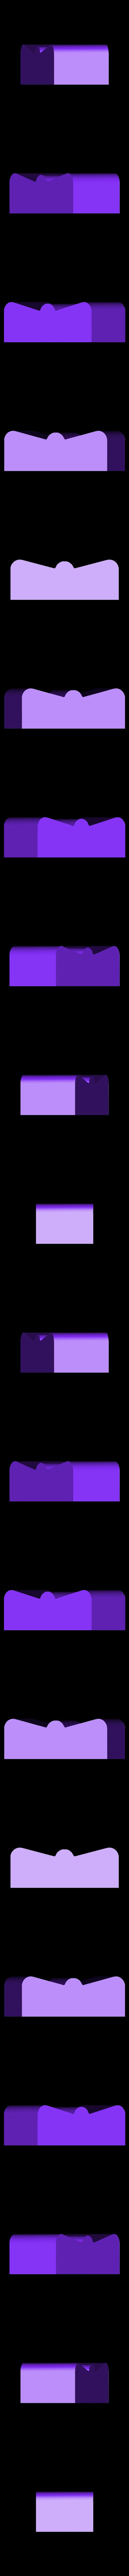 Casio_Keyboard_Switch.STL Download free STL file Casio Keyboard Switch Cover • 3D print design, ehans1c